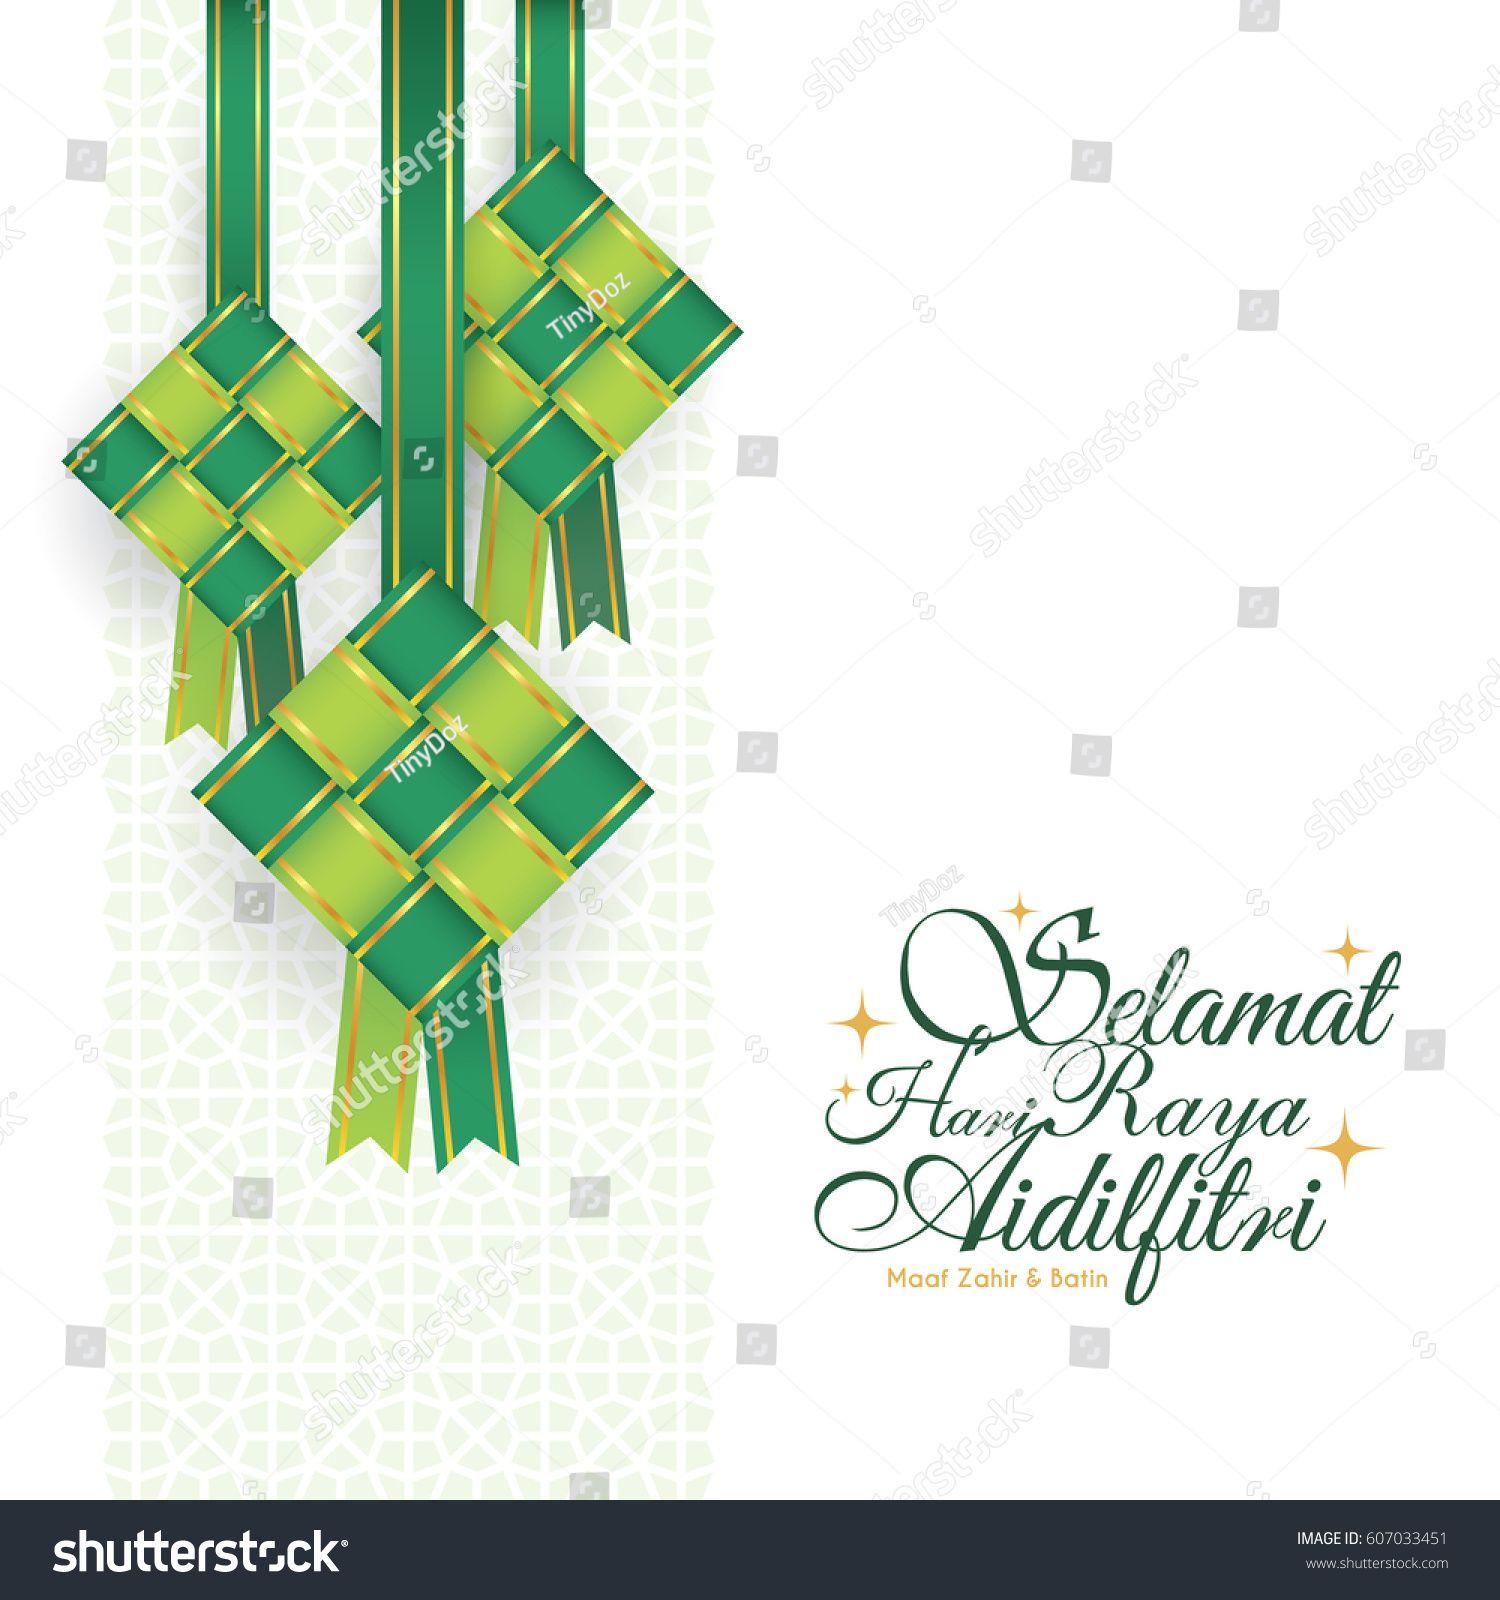 Selamat Hari Raya Aidilfitri Greeting Card Vector Ketupat With Islamic Pattern As Background Tr Greeting Card Design Eid Card Designs Greeting Card Template